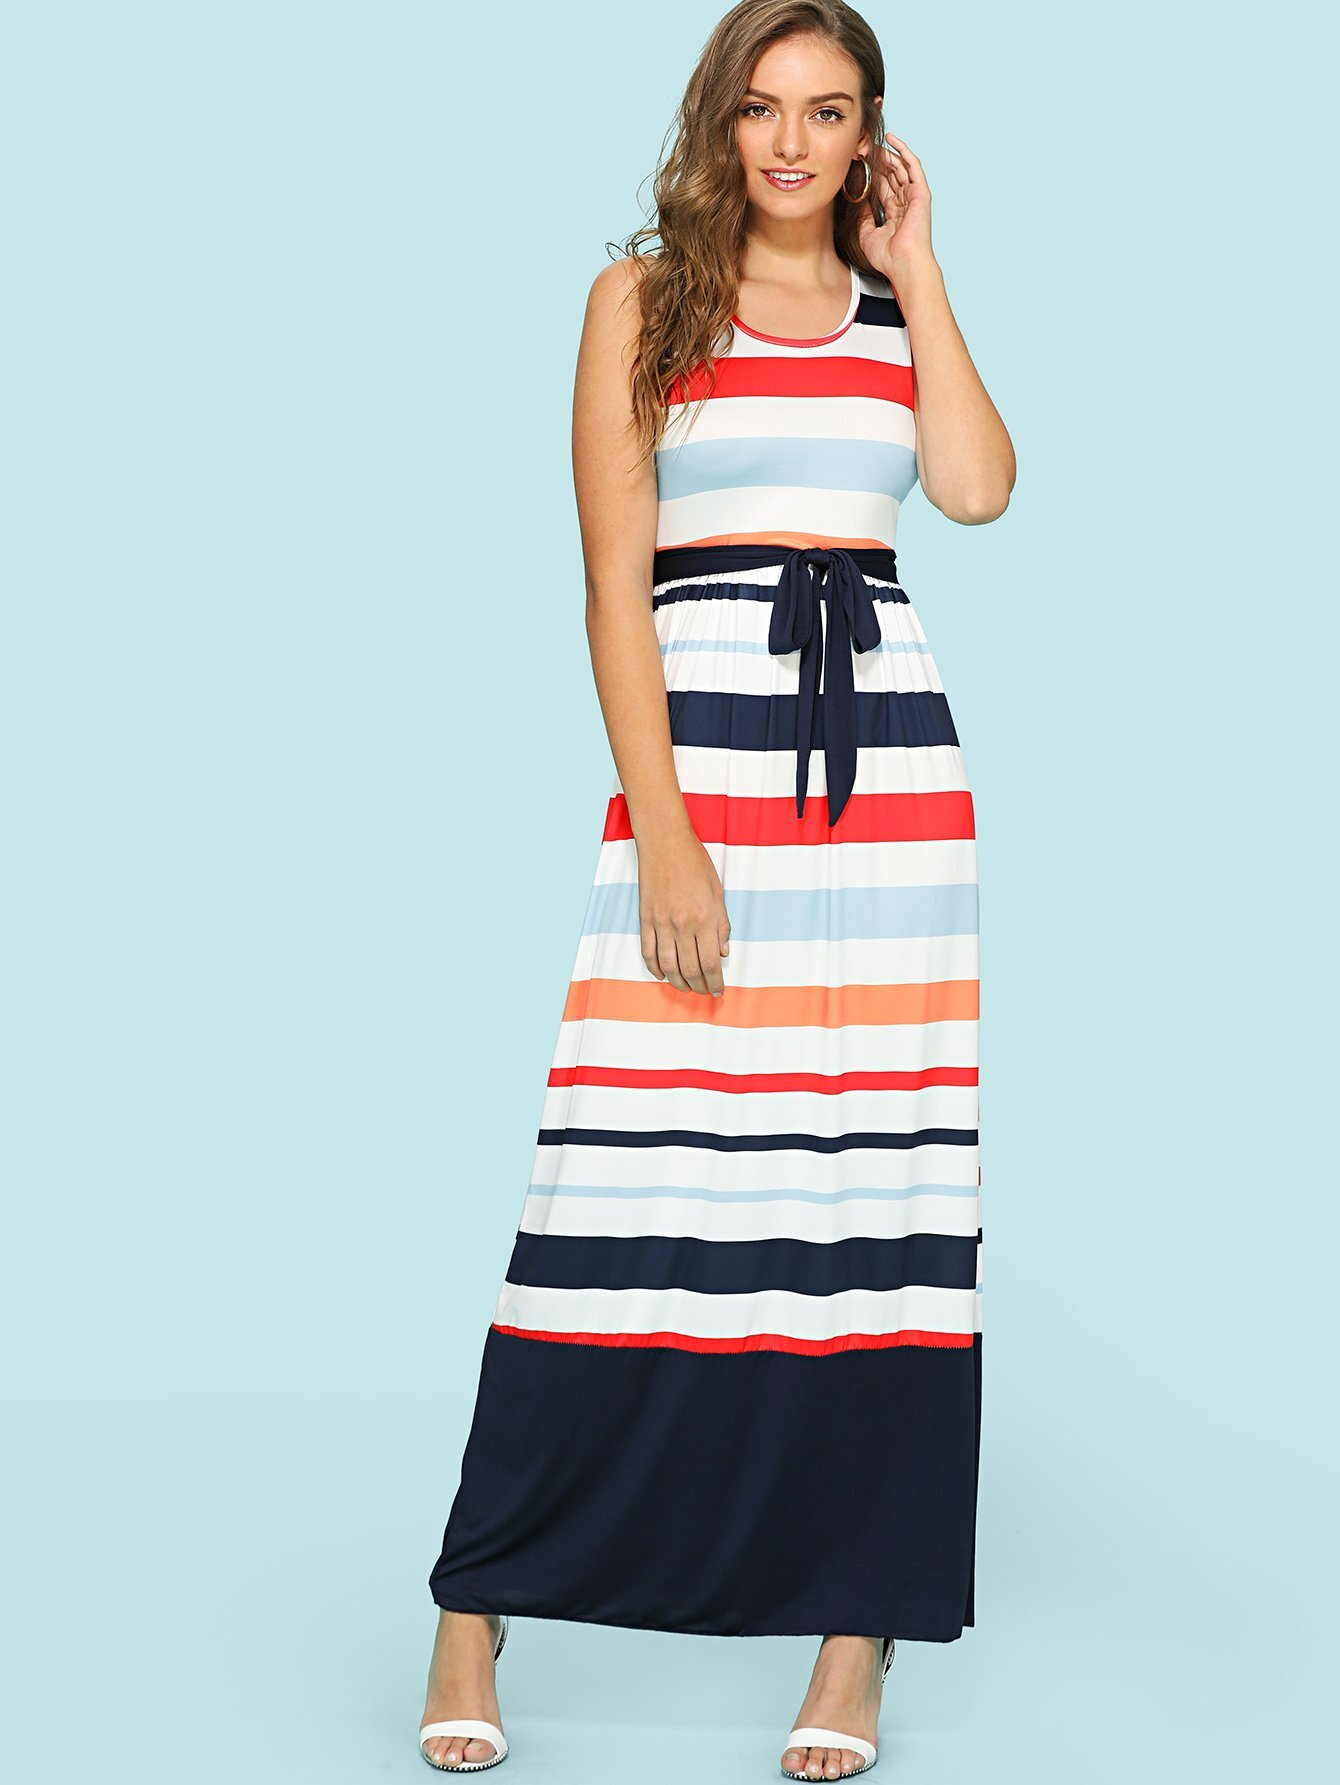 Colorblock Drawstring Waist Dress drawstring waist tank dress